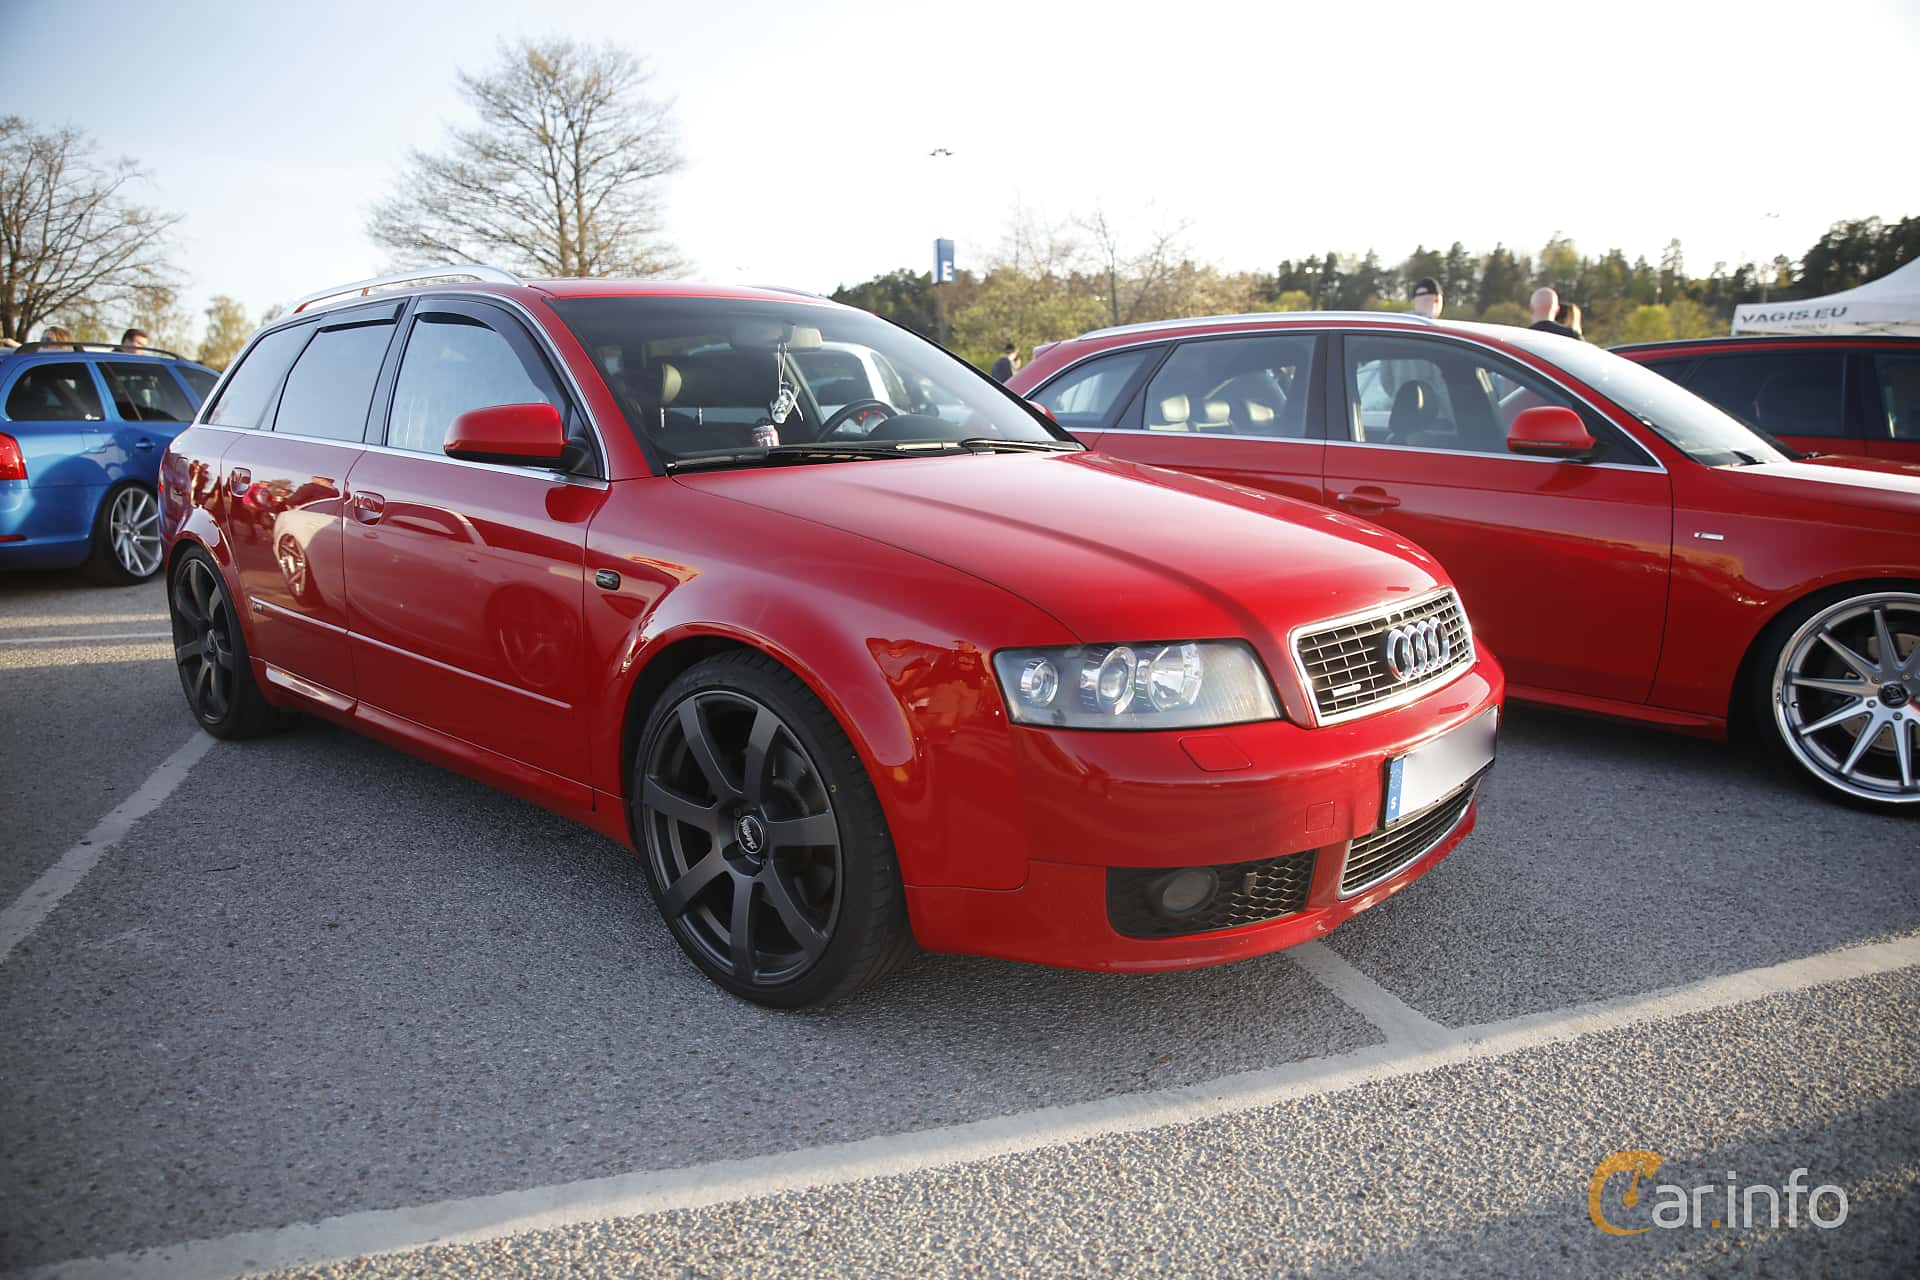 Kekurangan Audi A4 3.0 Quattro Spesifikasi